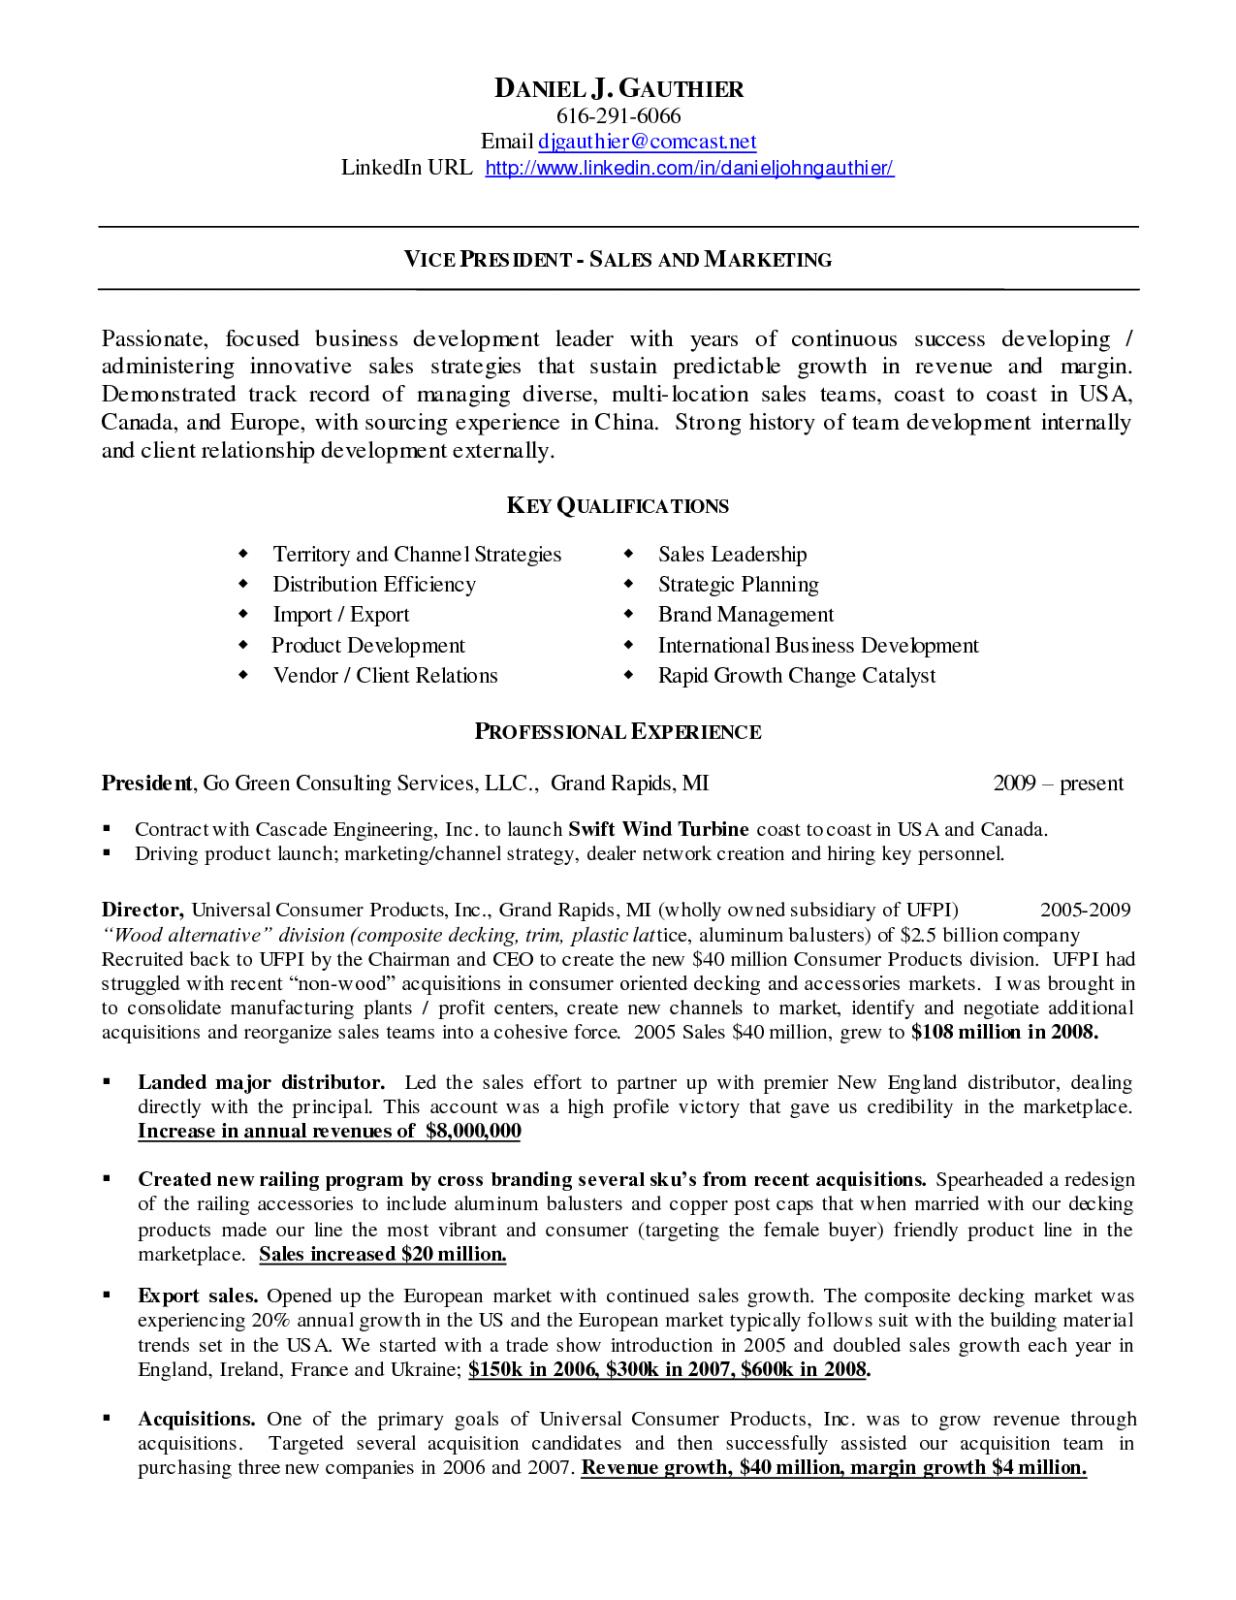 15 The Full Job Interview Resume/Linkedin & Community